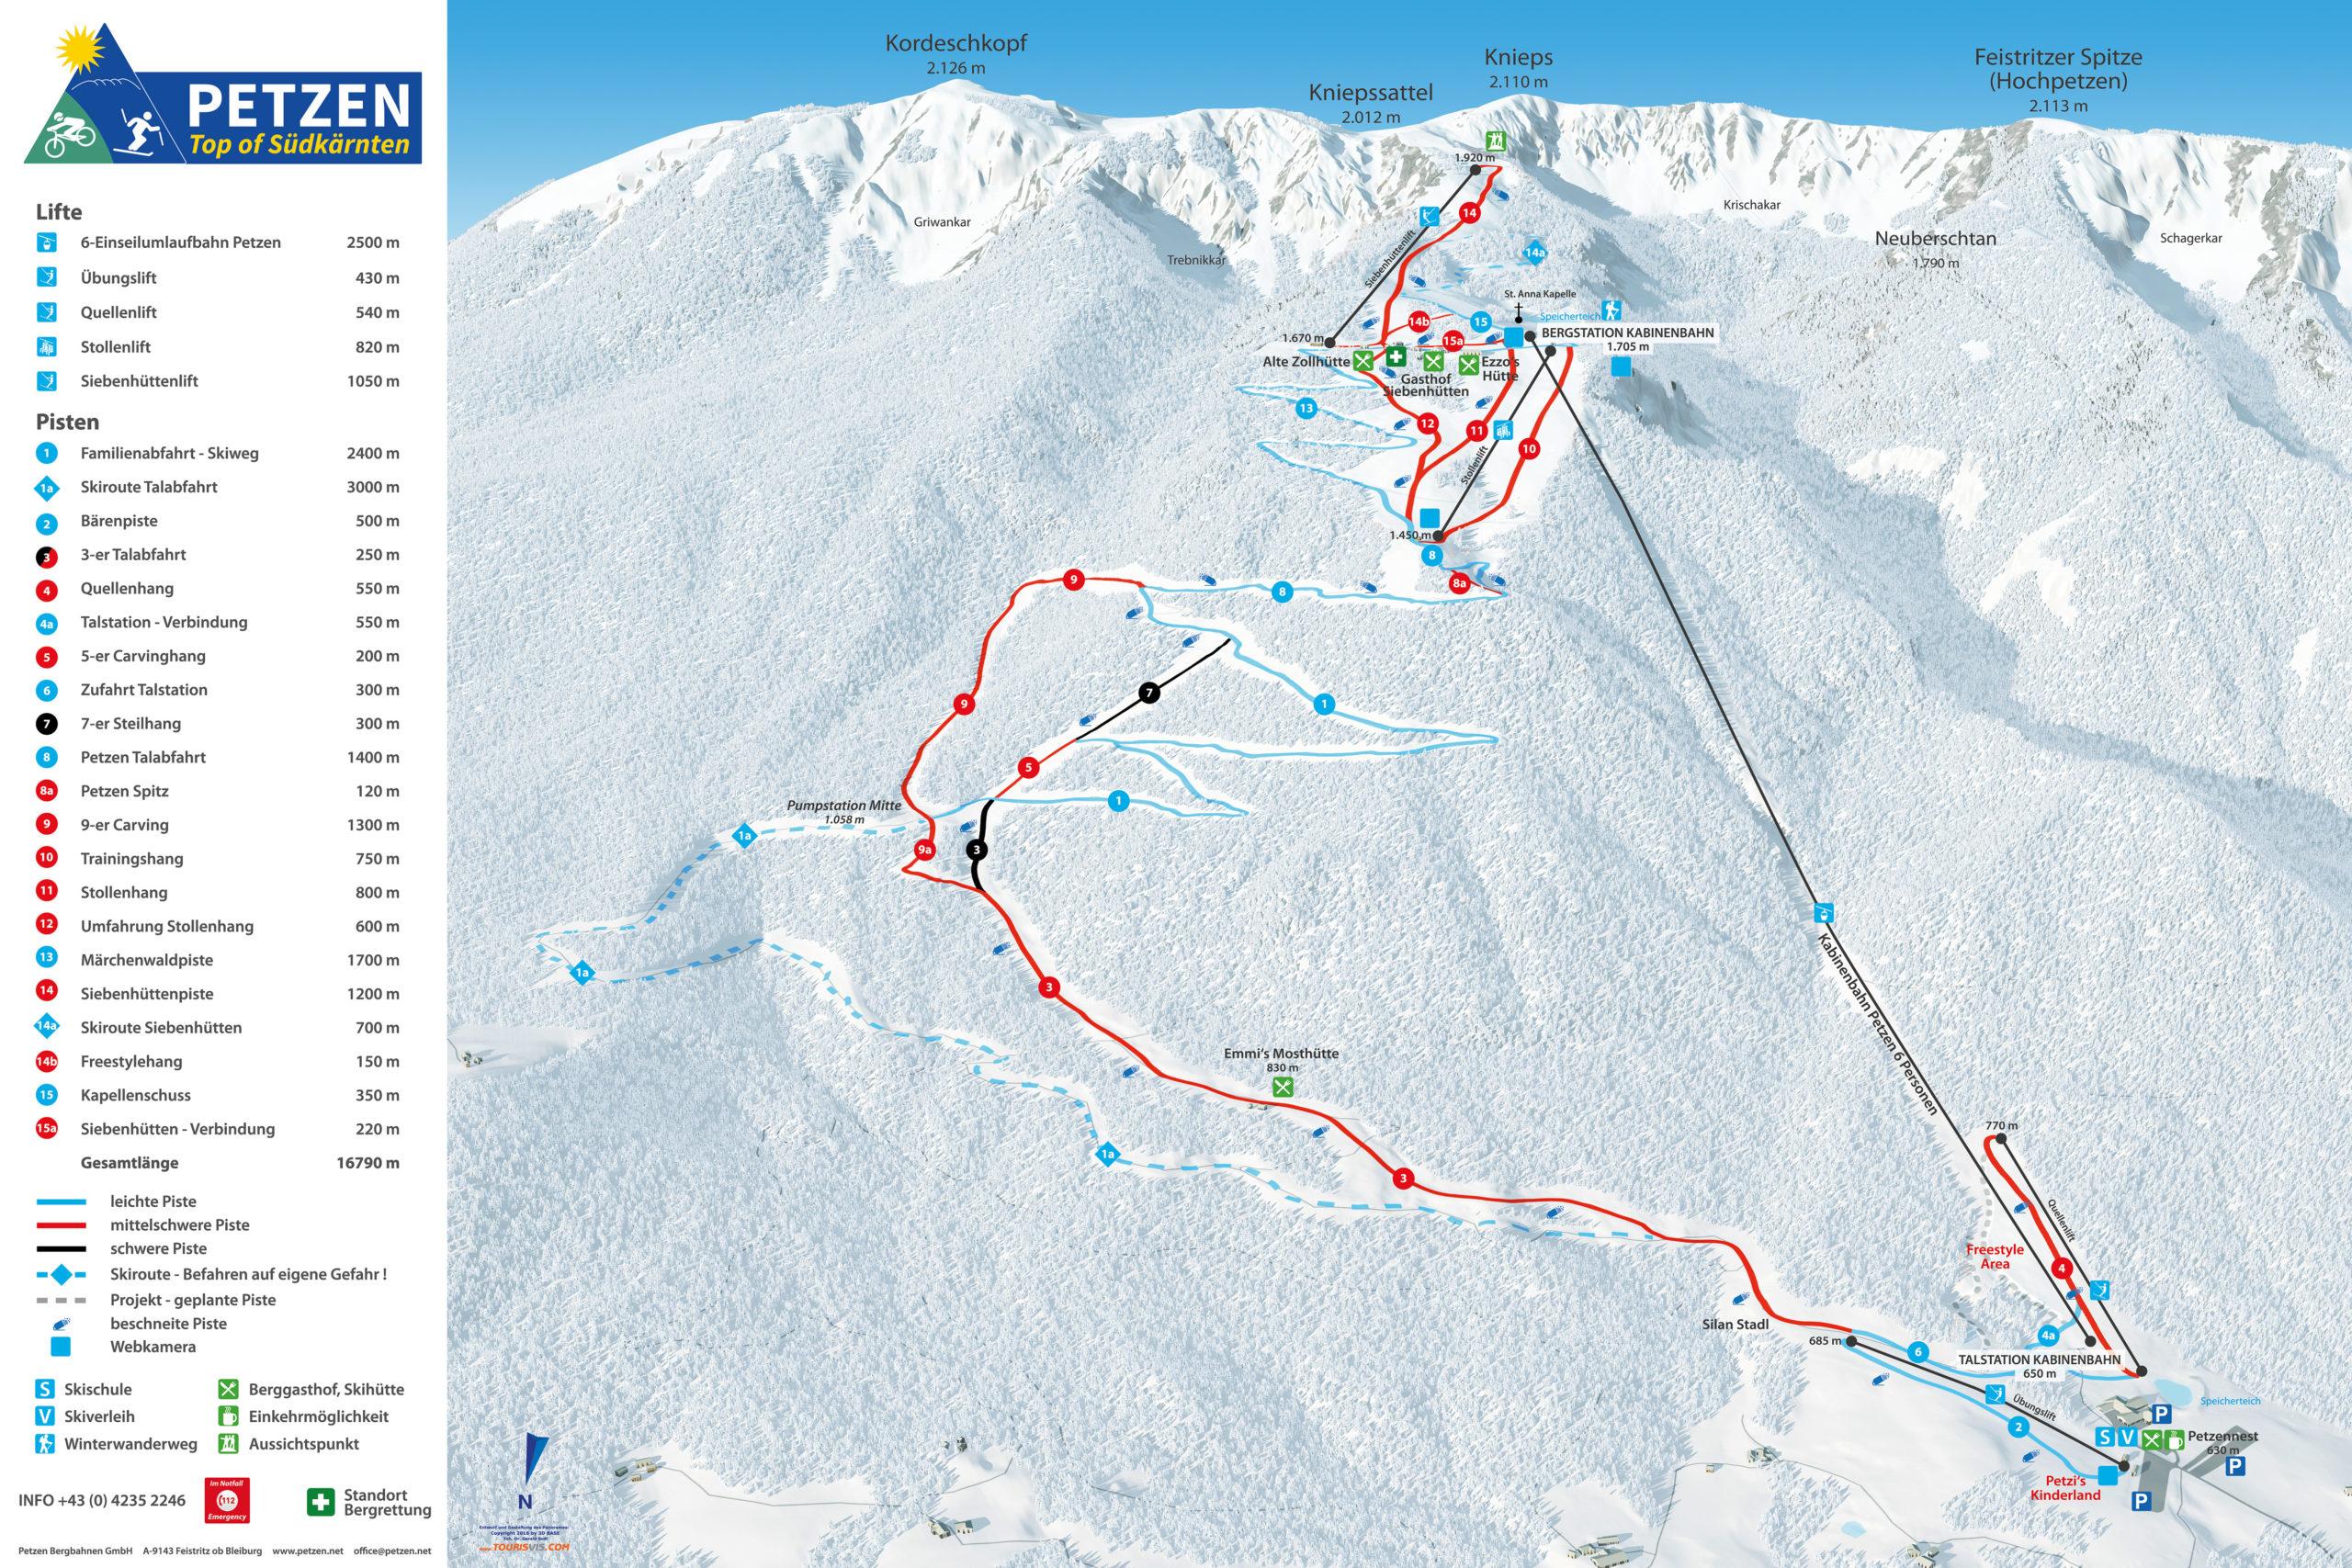 3D Pistenplan und Panoramakarte Winterpanorama Petzen Suedkaernten